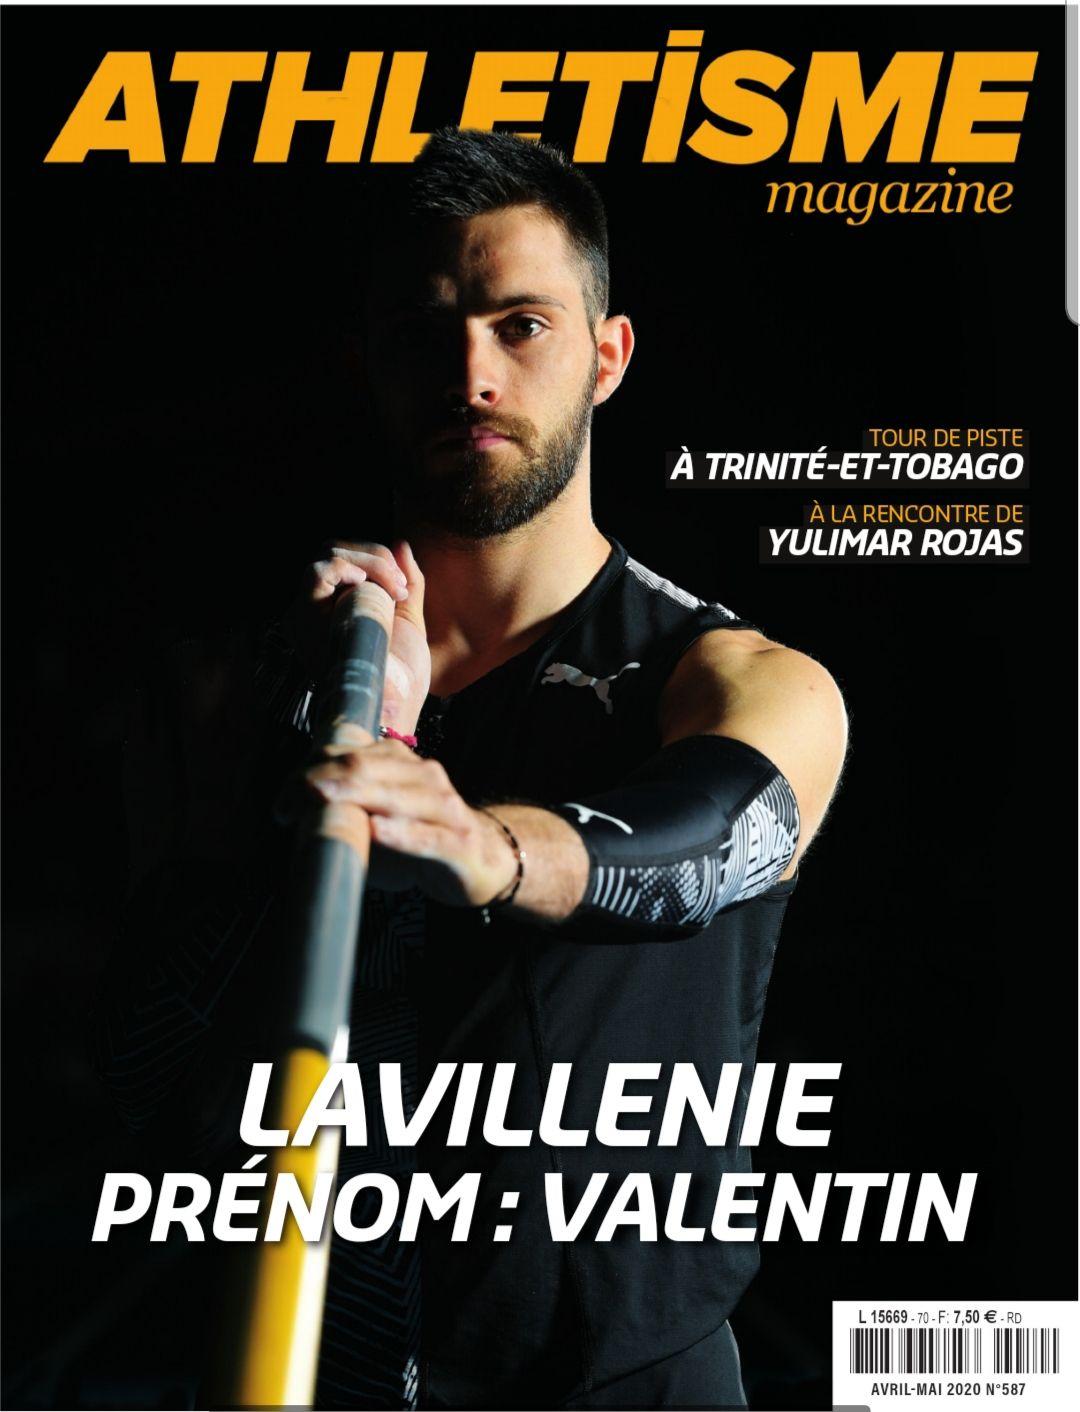 eBook Athlétisme magazine (Avril-Mai) gratuit (Dématérialisé)